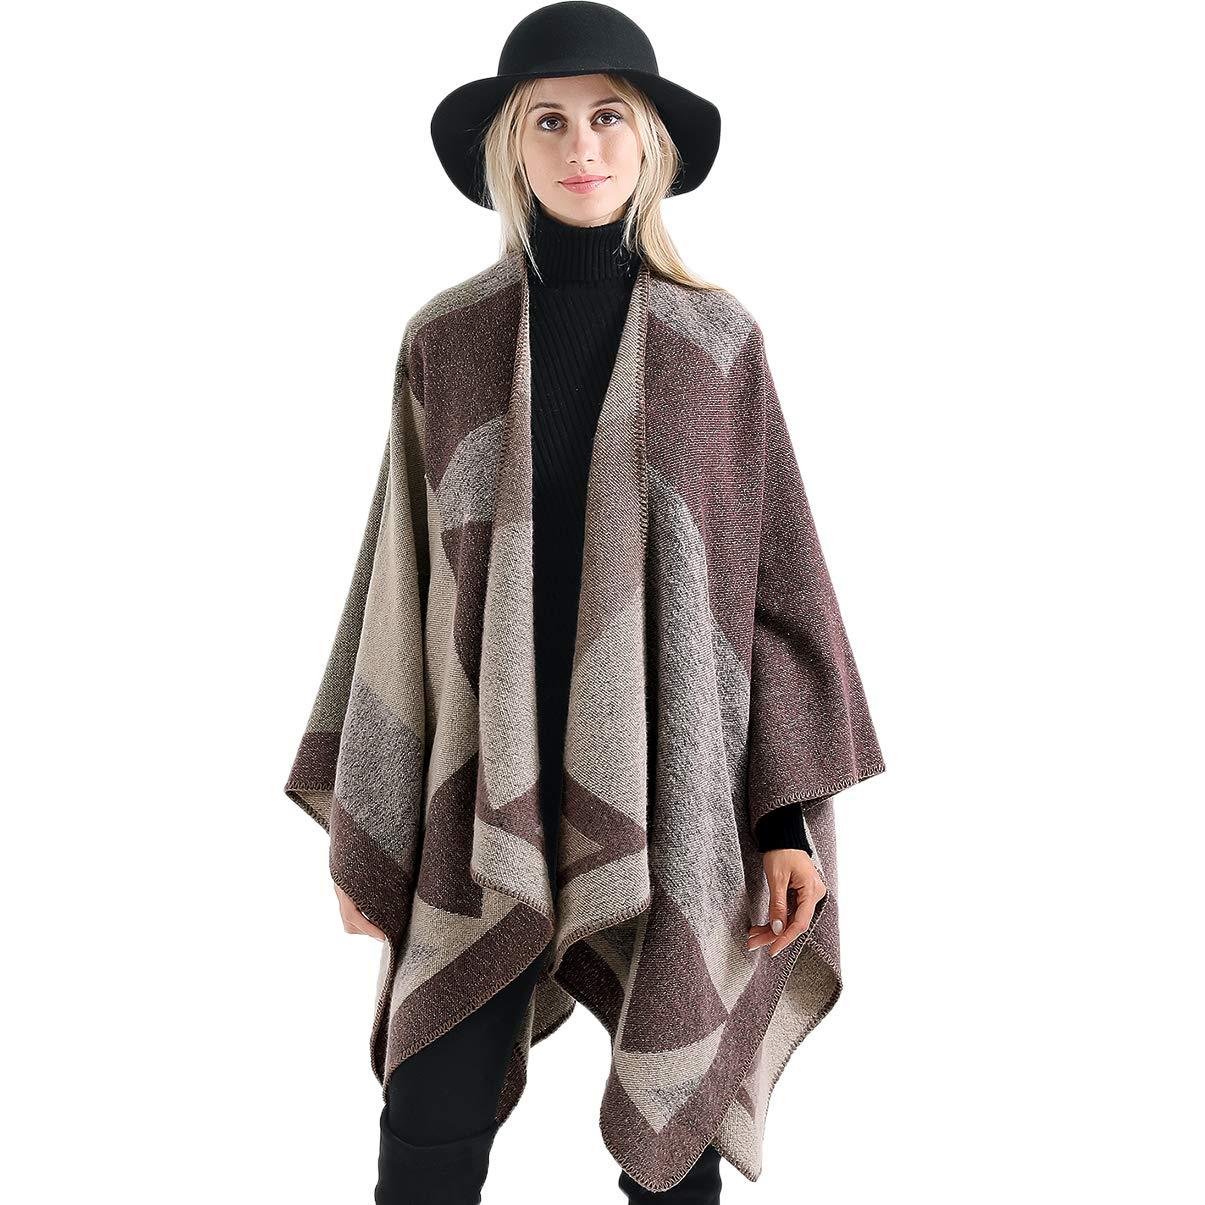 Vbiger Damen Poncho Schal Wrap Farbblock Open Front Cape Übergroße Winterdecke Reversible Schal Dicke Cardigan Coat, Khaki